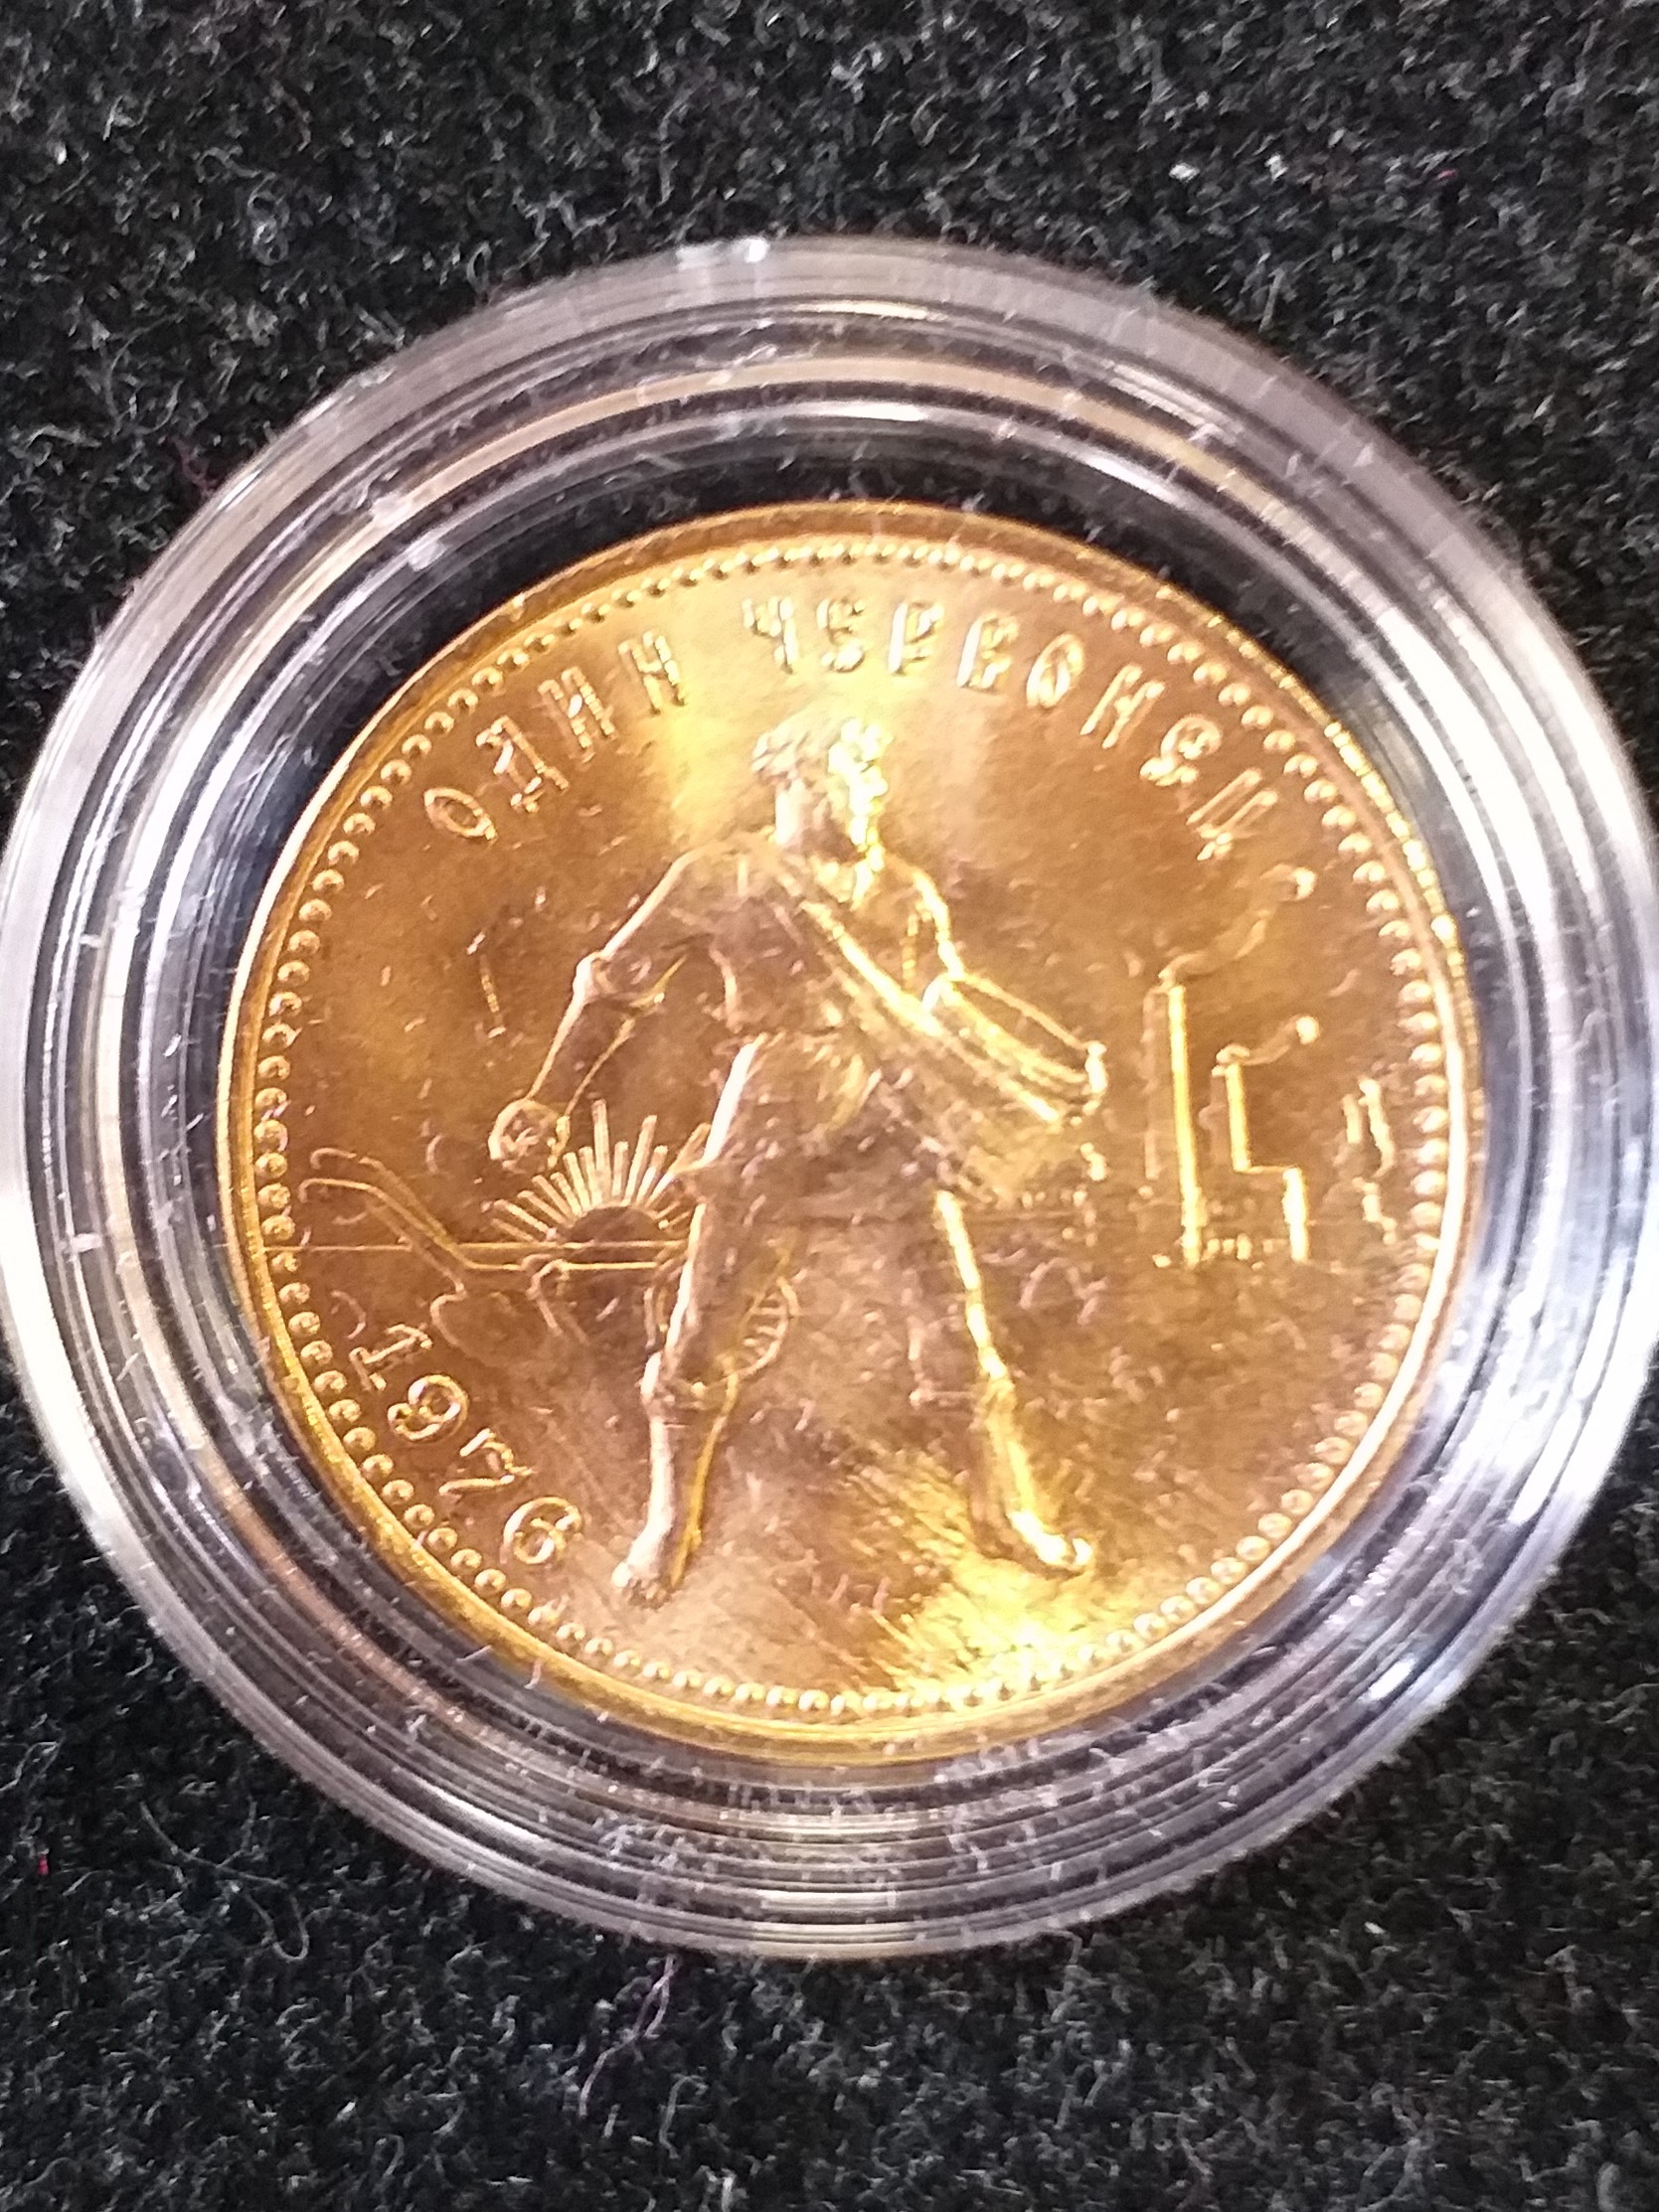 Златна монета руски червонец, 1976 г.